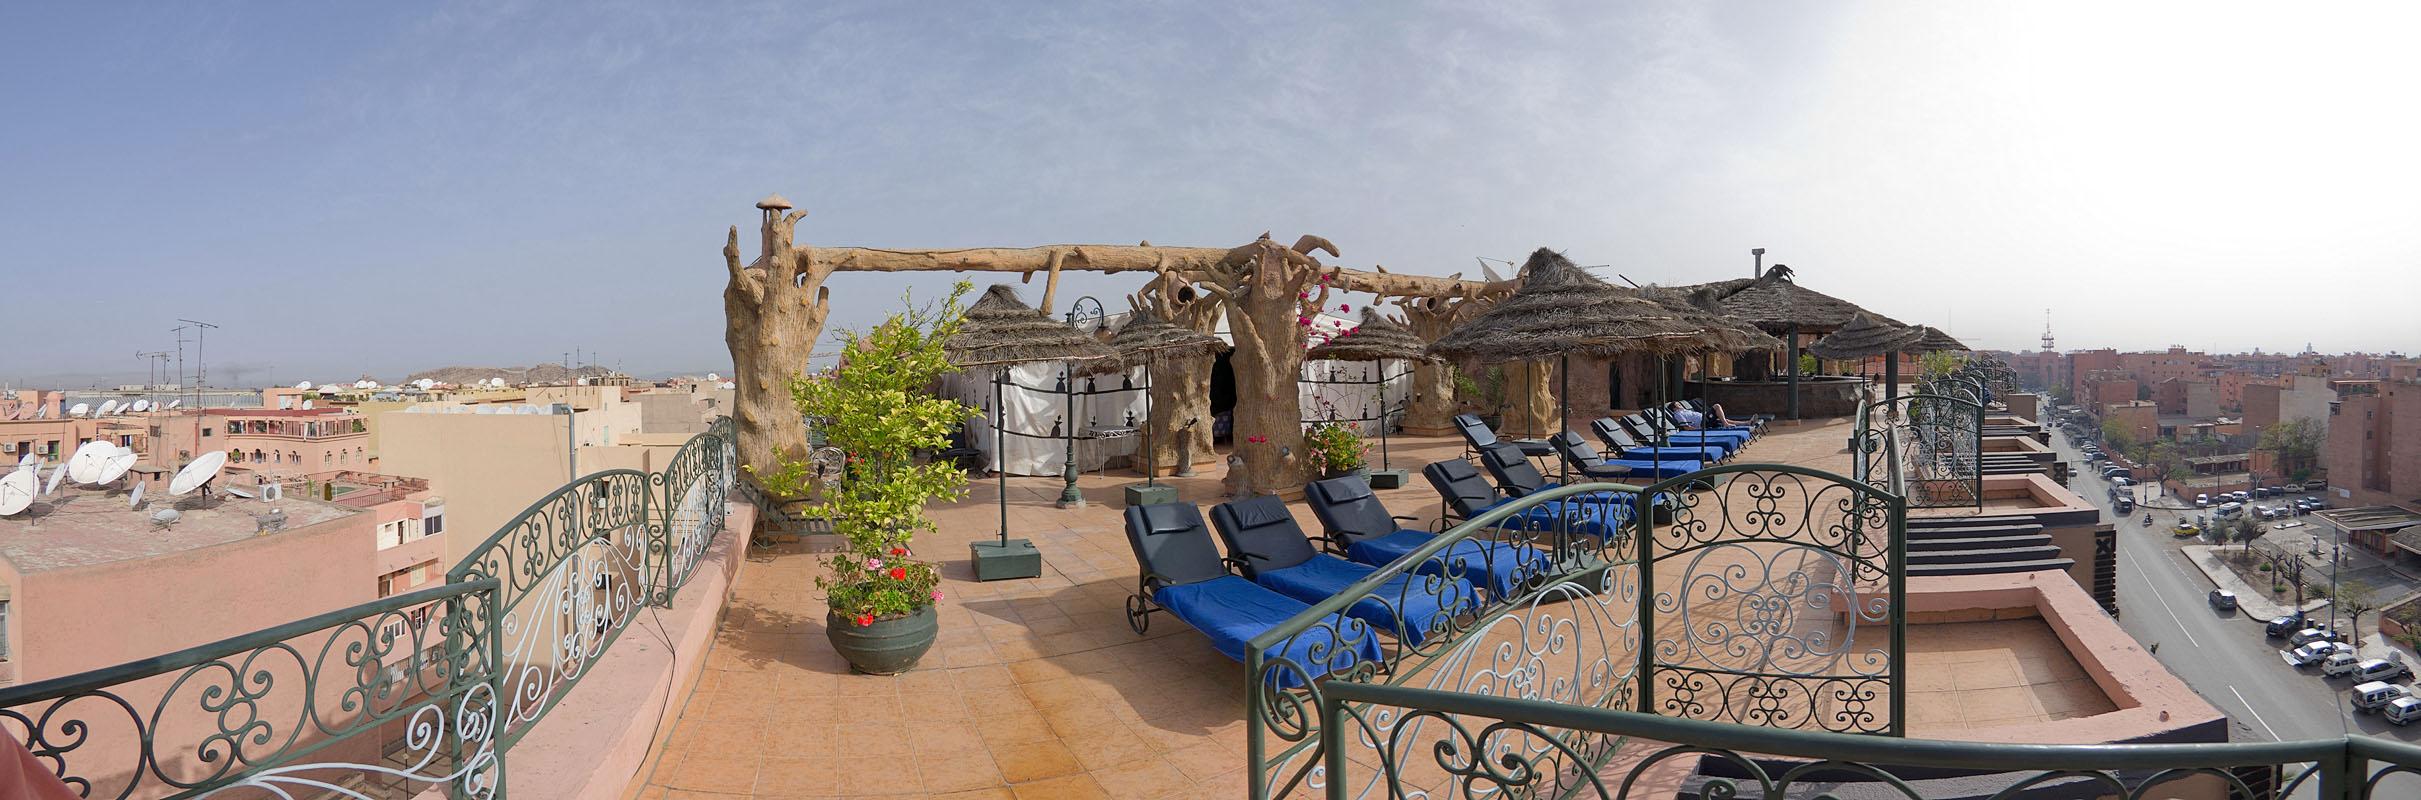 Hotel roof in Marrakech